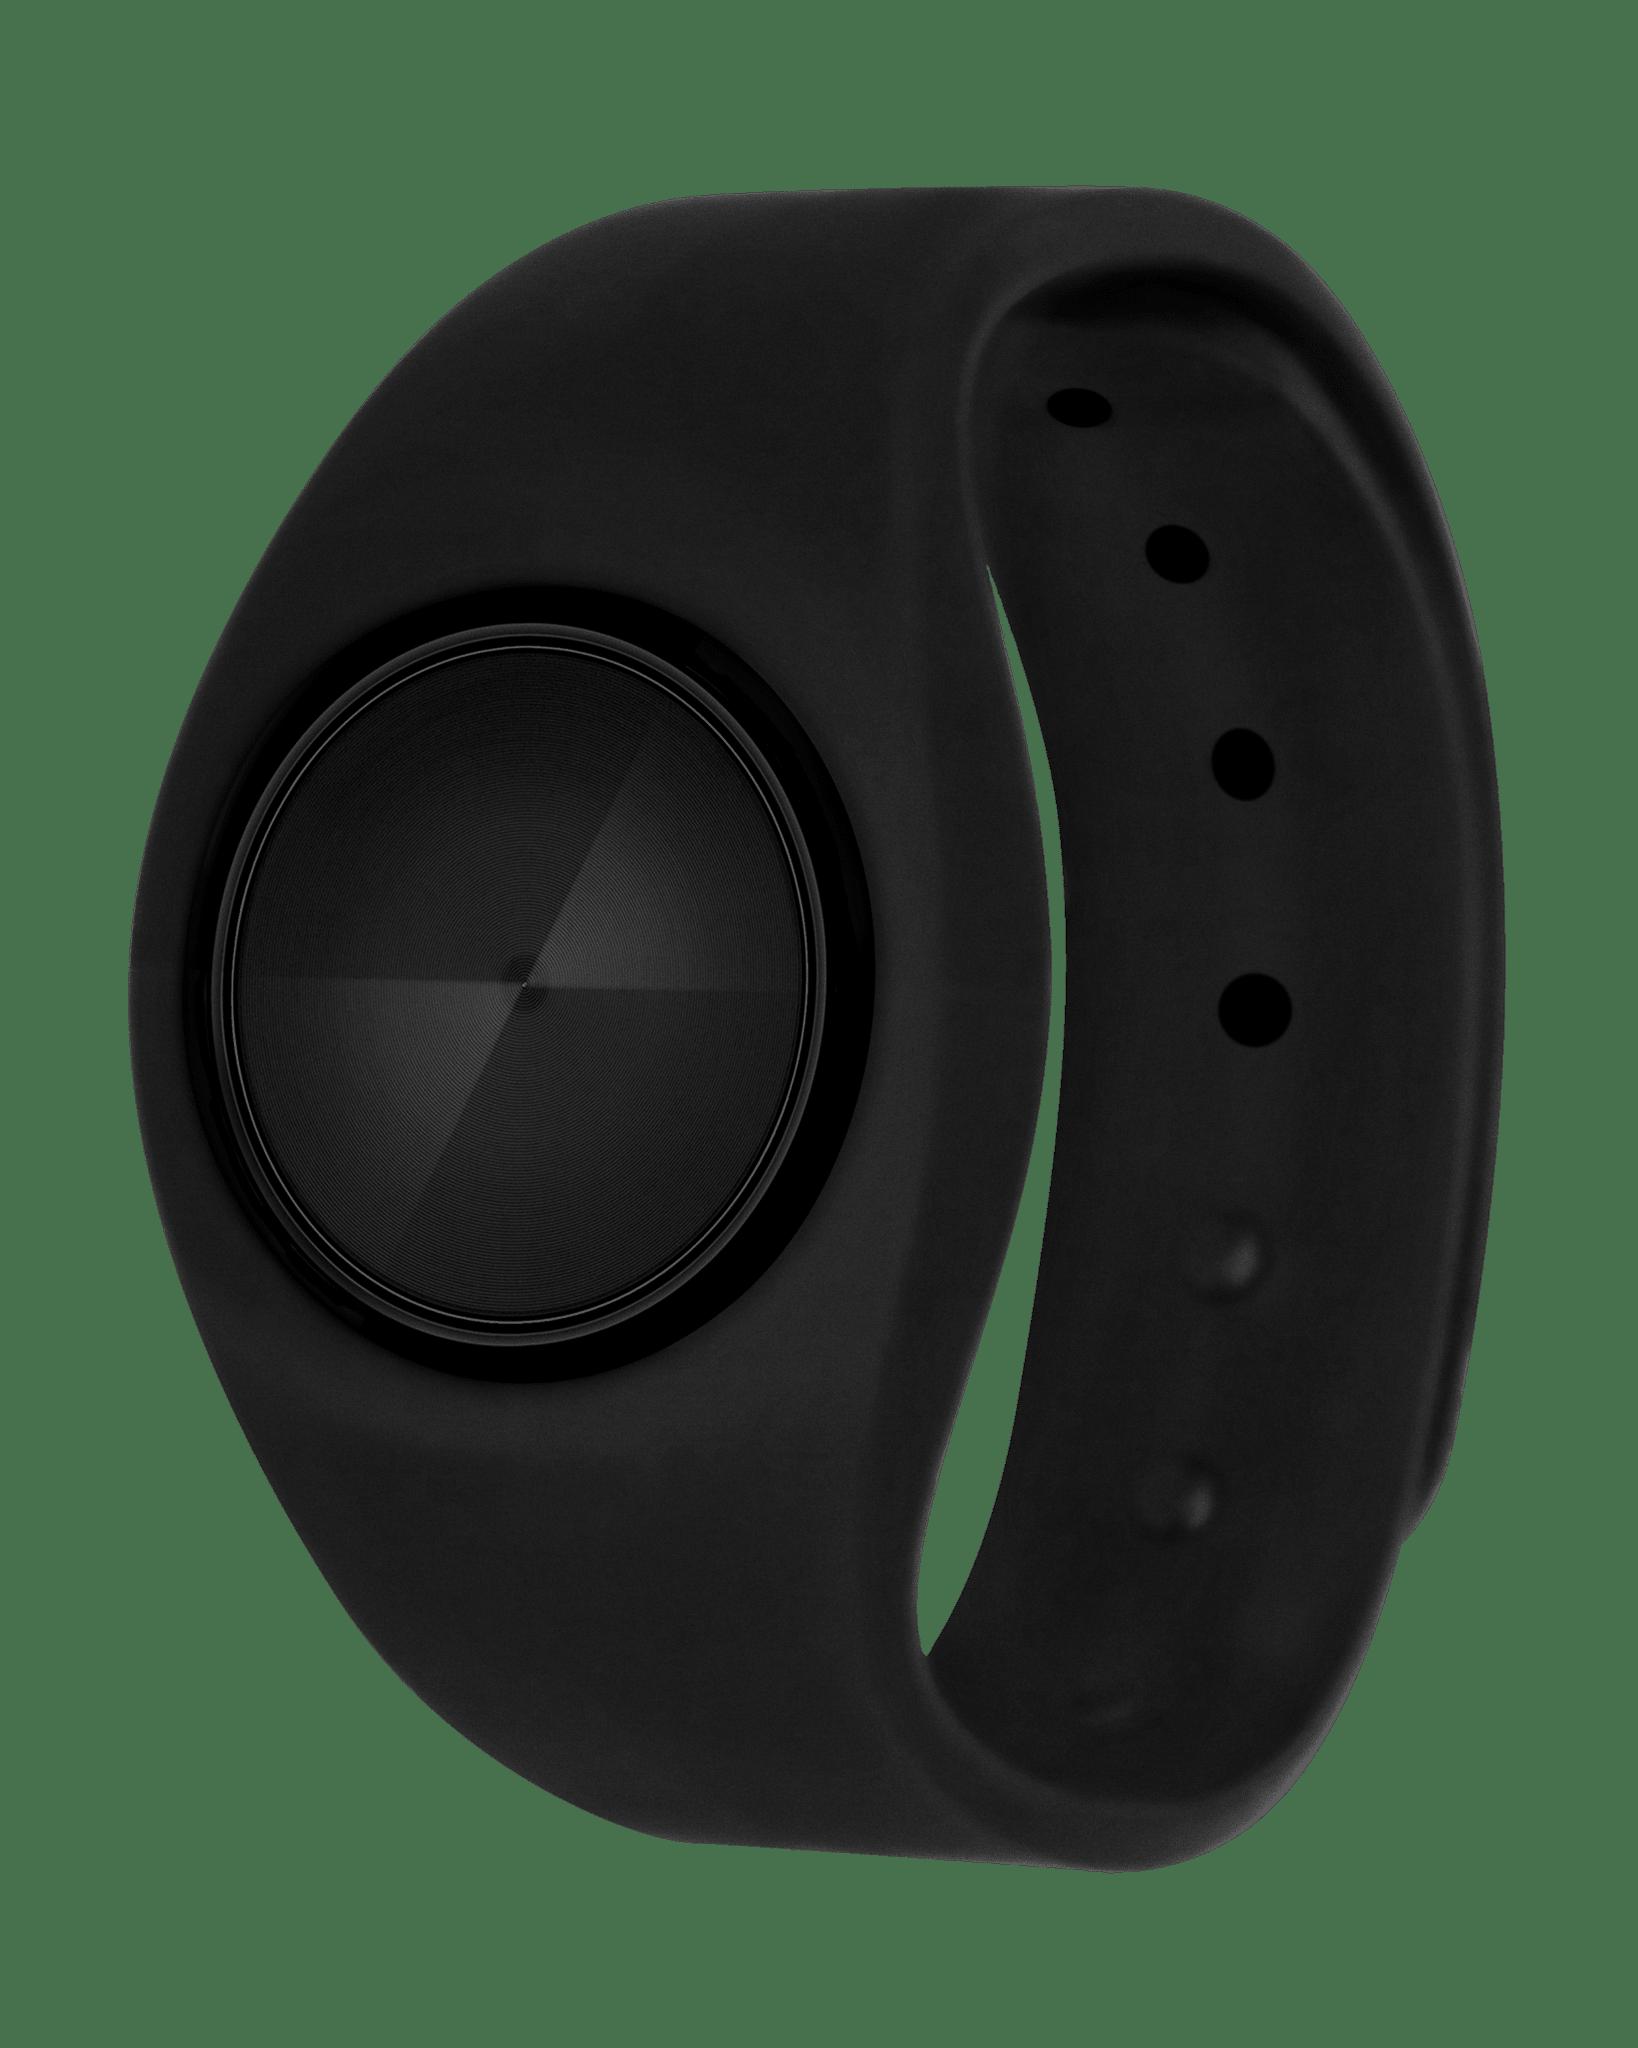 V.ALRT wrist watch with comfortable adjustable band